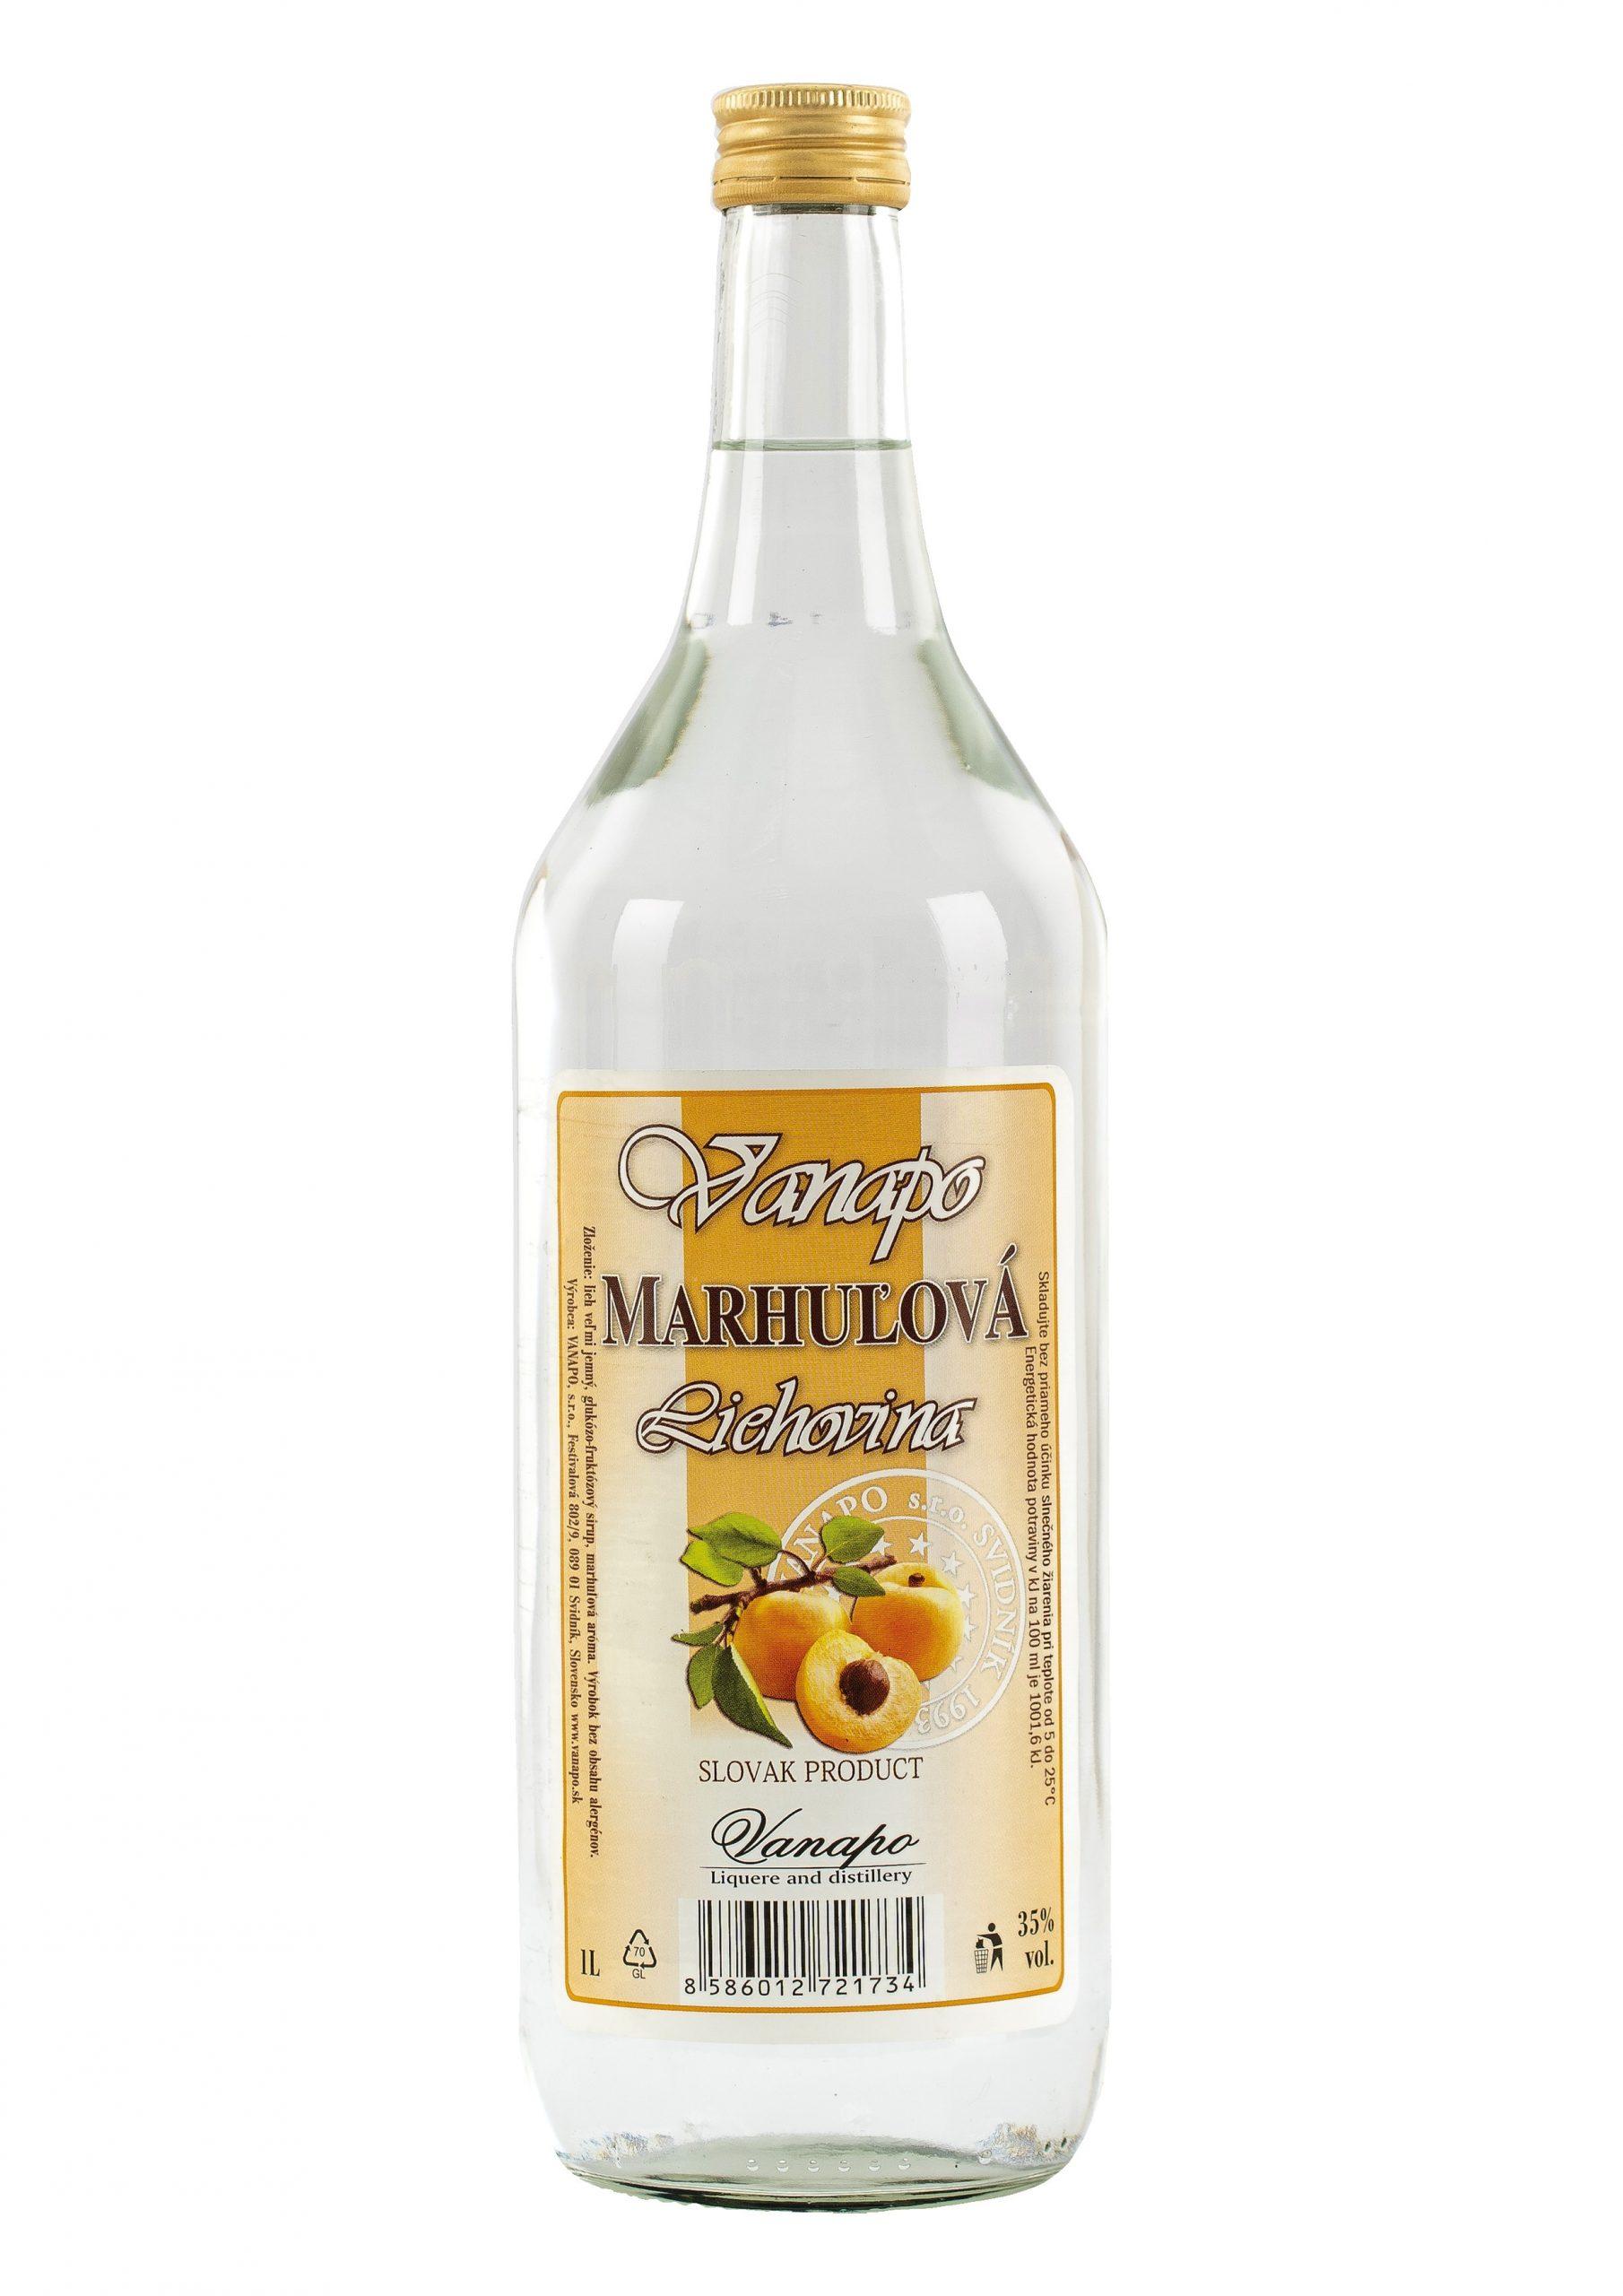 Marhulova liehovina 35 scaled 1 - Marhuľová liehovina